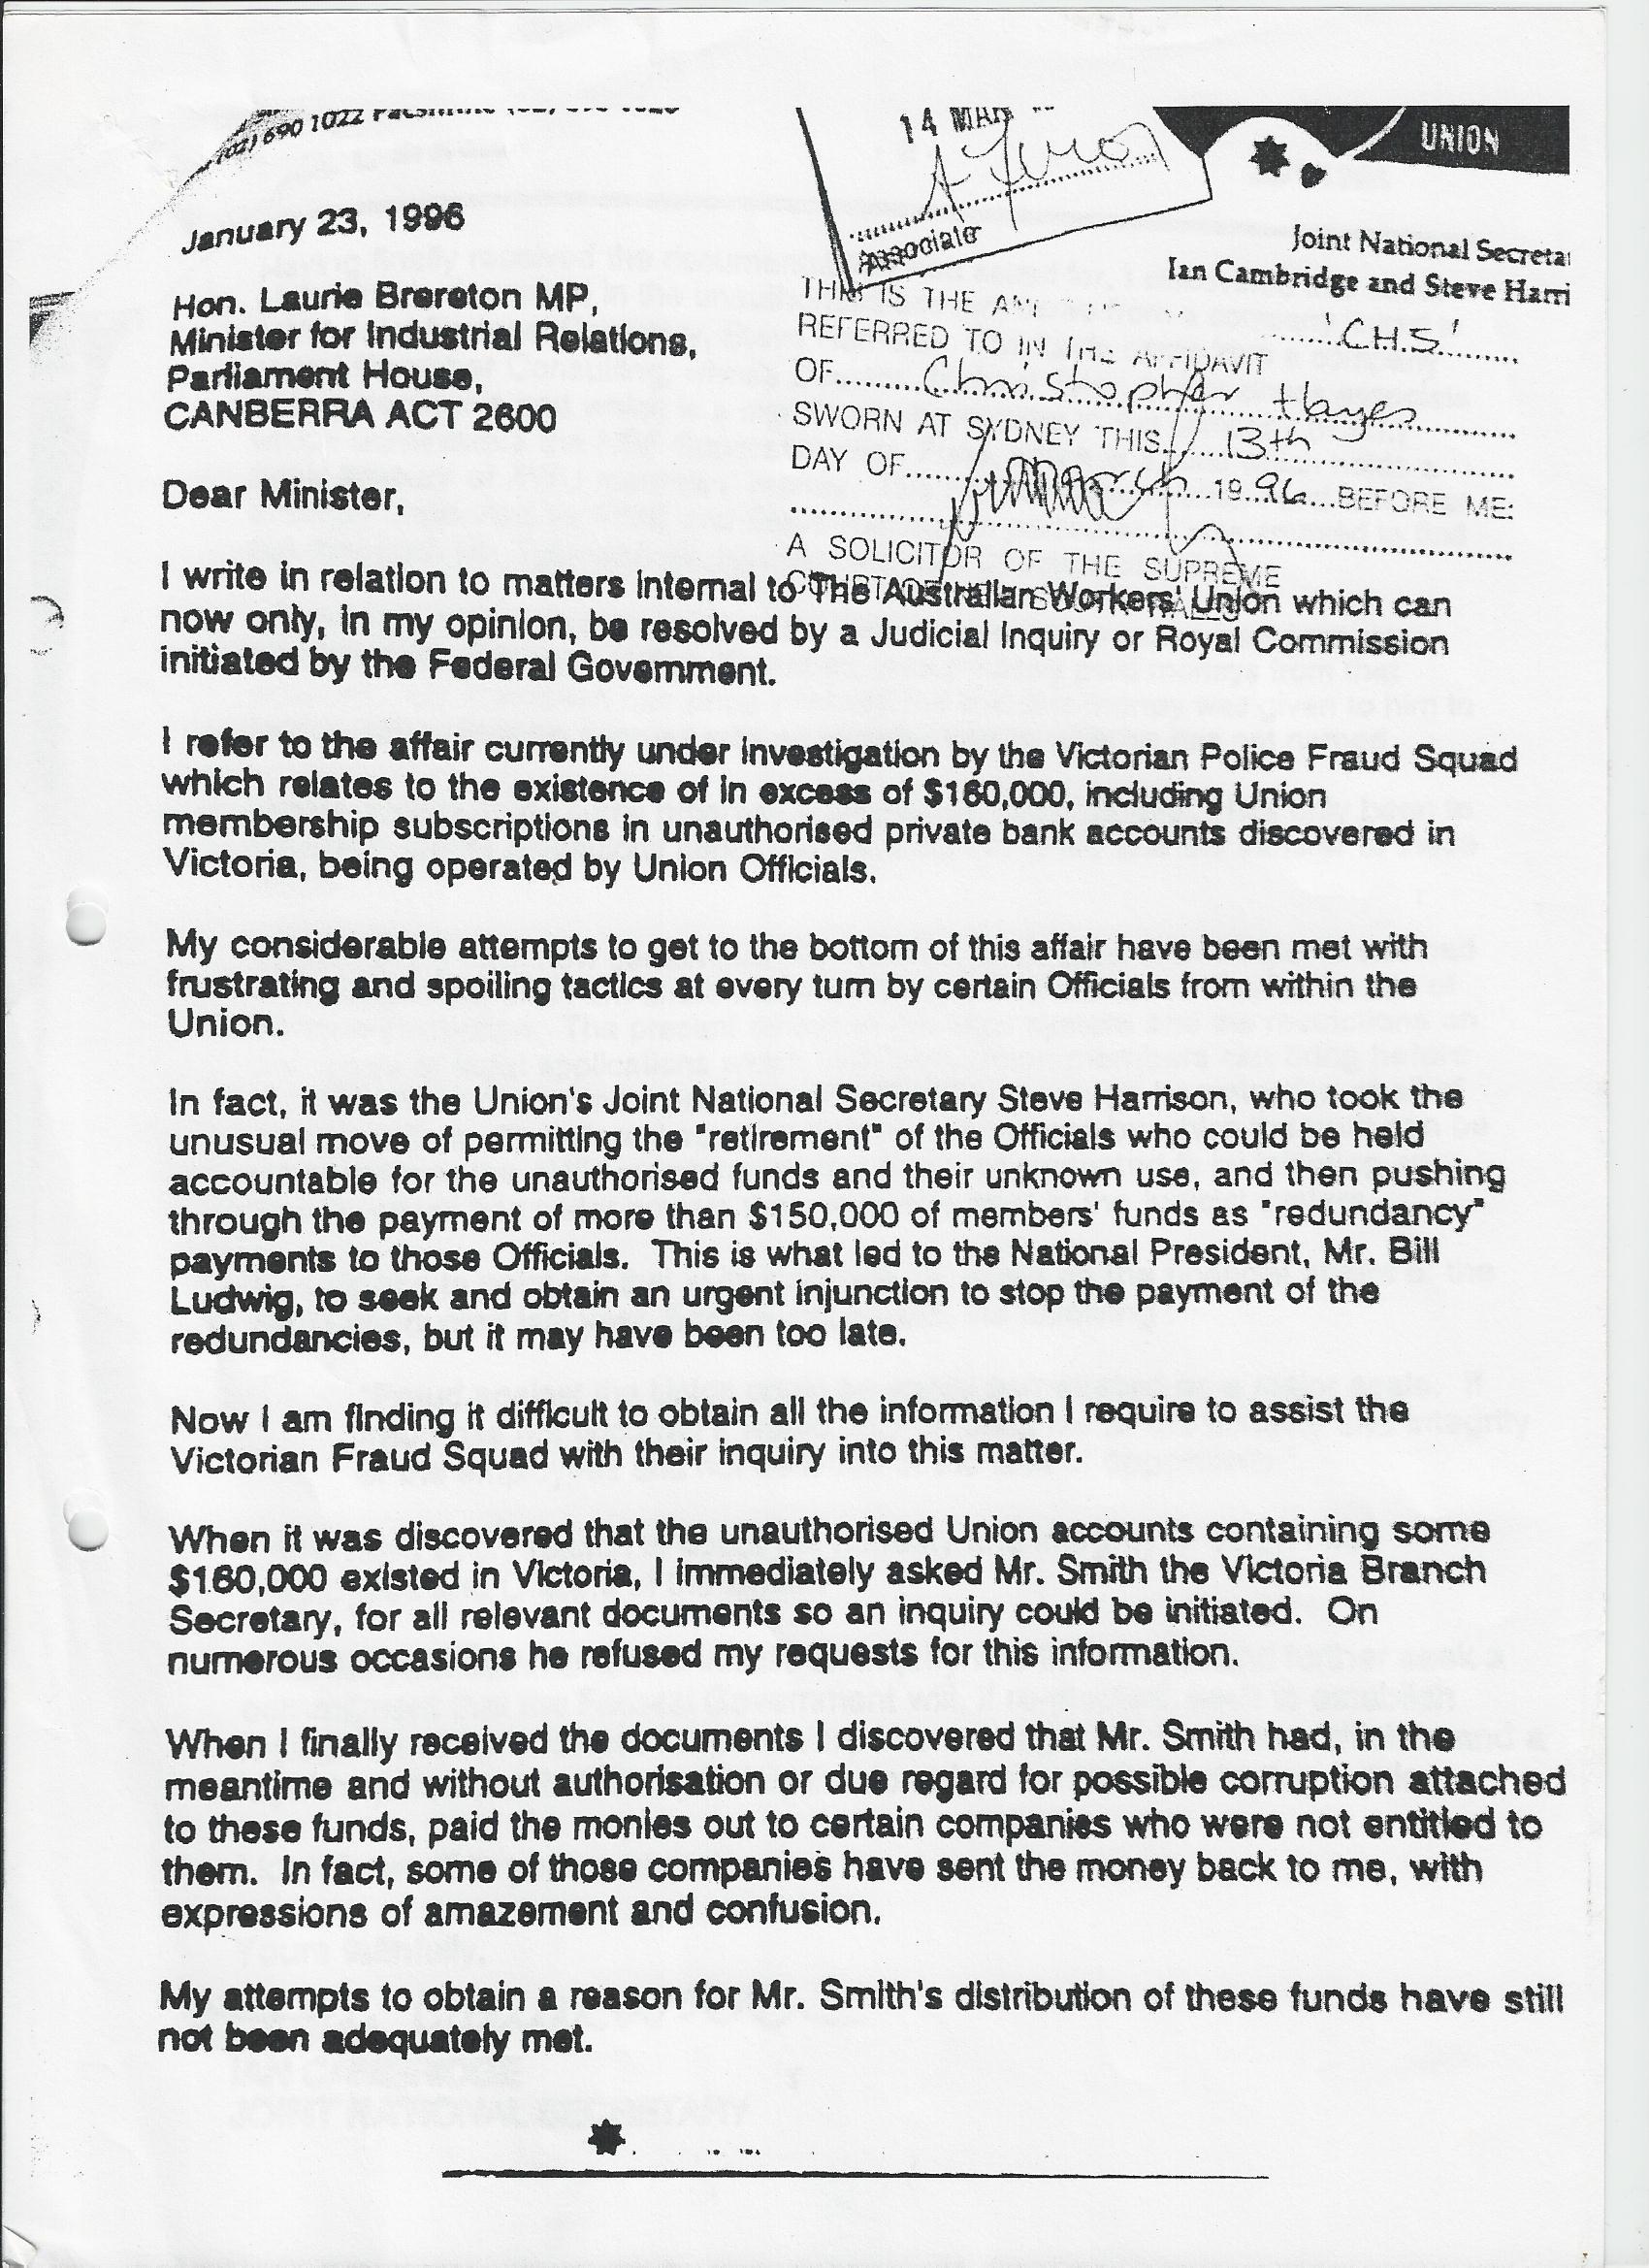 6a0177444b0c2e970d017d3cc8c572970c pi 123 the awu scandal the property purchase slater and gordon fees written falaconquin